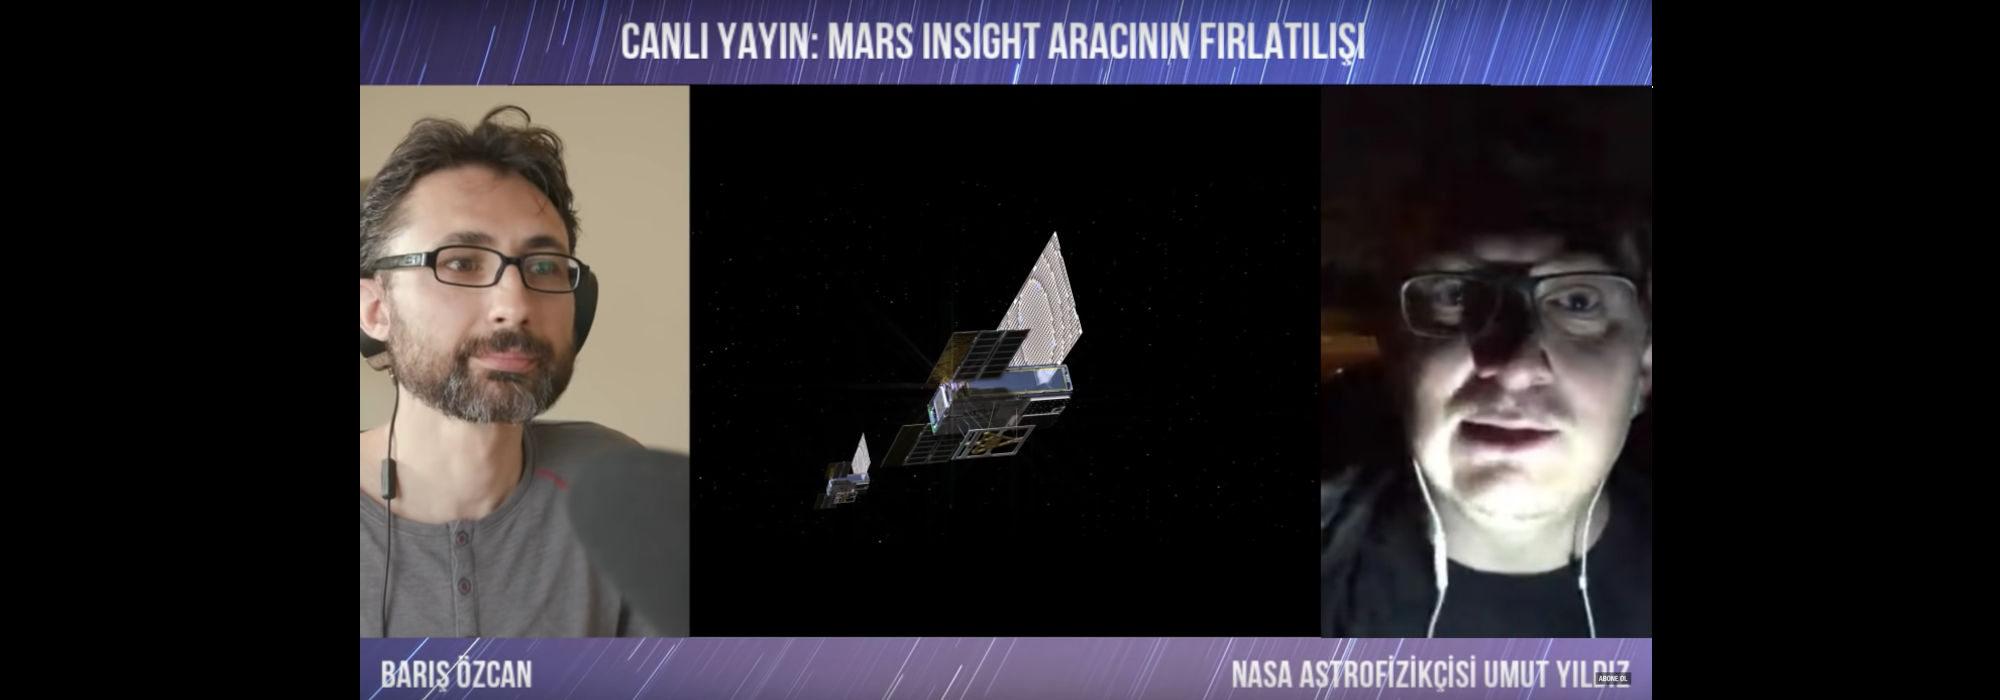 Barış Özcan'la Mars InSight Aracının Fırlatılışı (CANLI YAYIN) #insightMarsaGidiyor